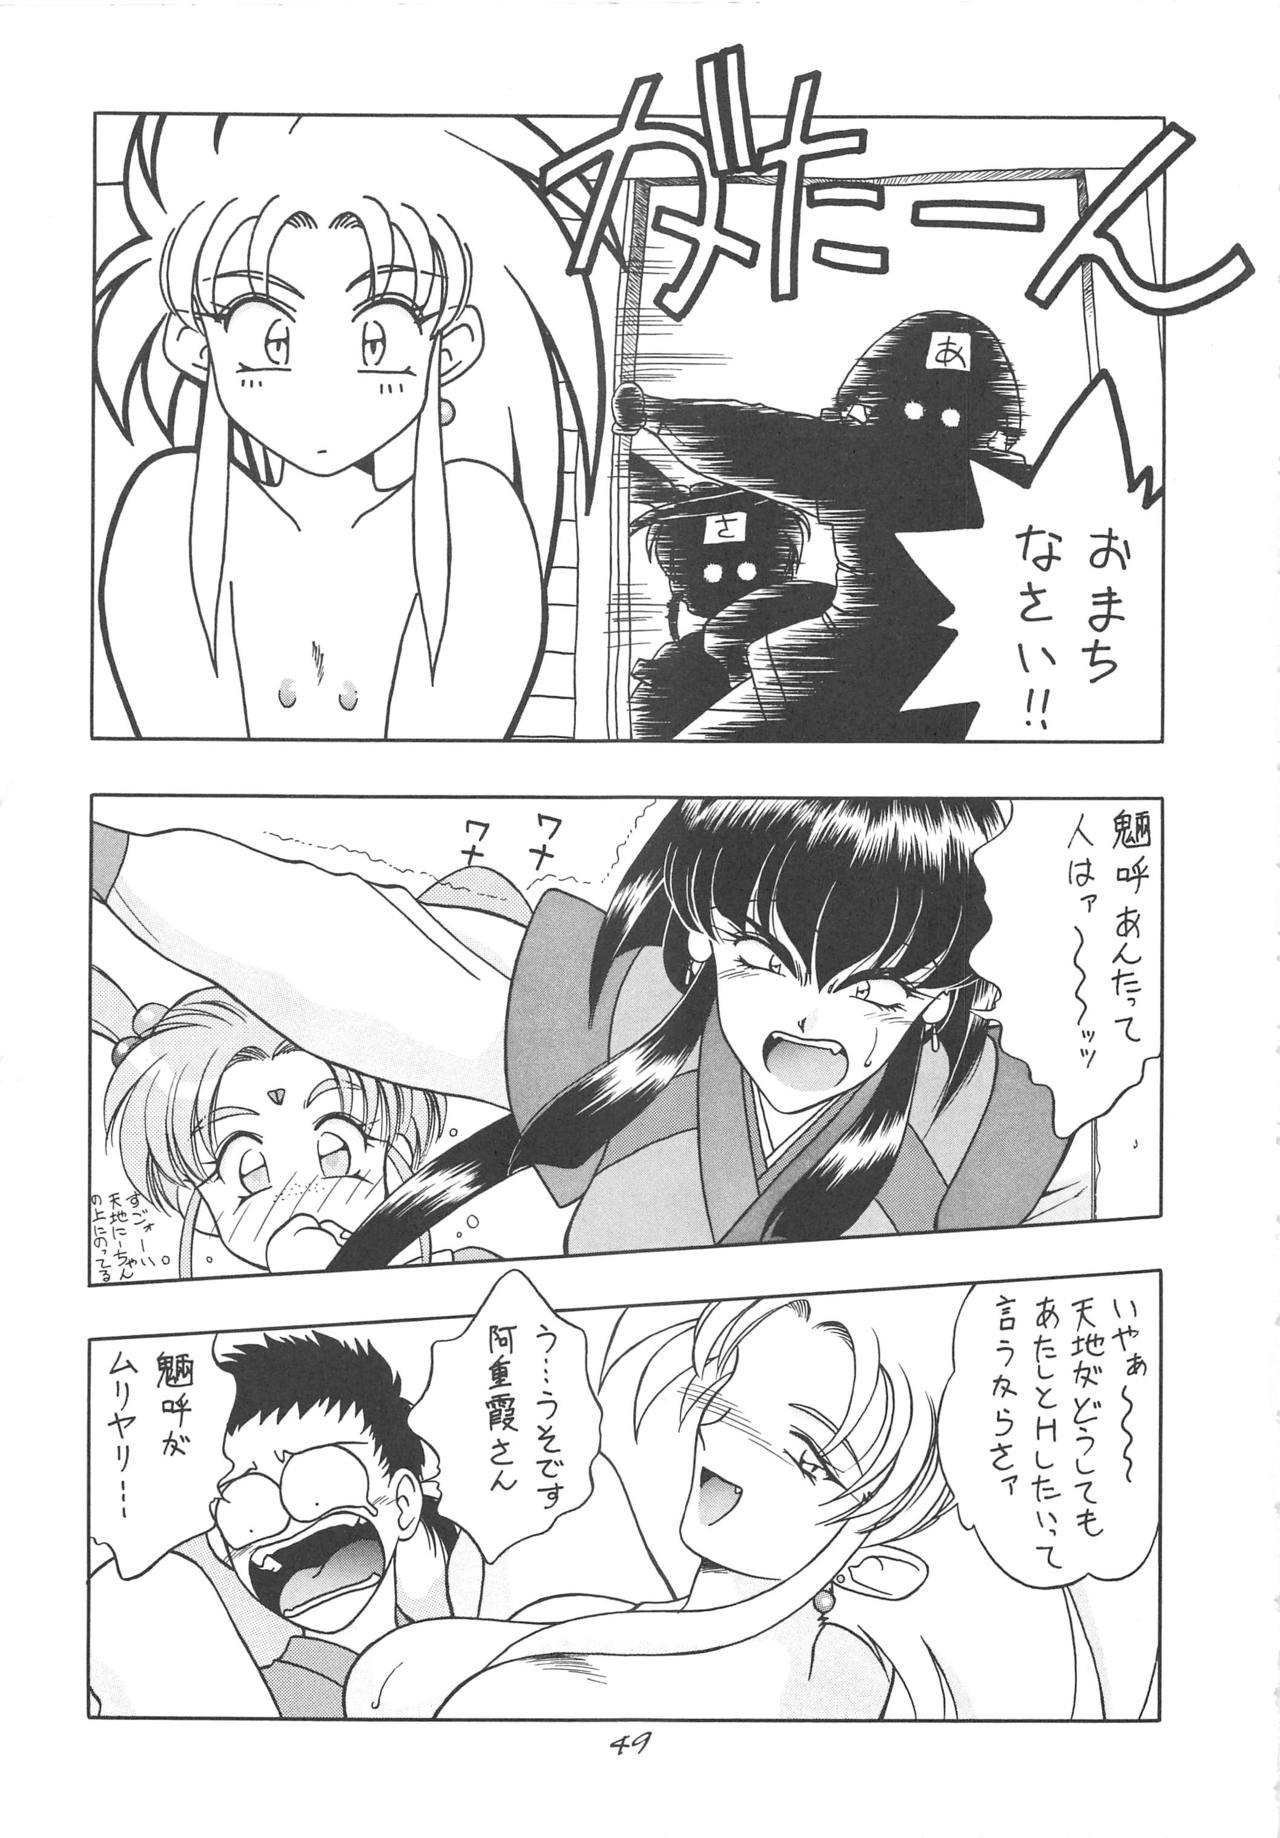 INDIVIDUAL 3 - 19930816 → 48